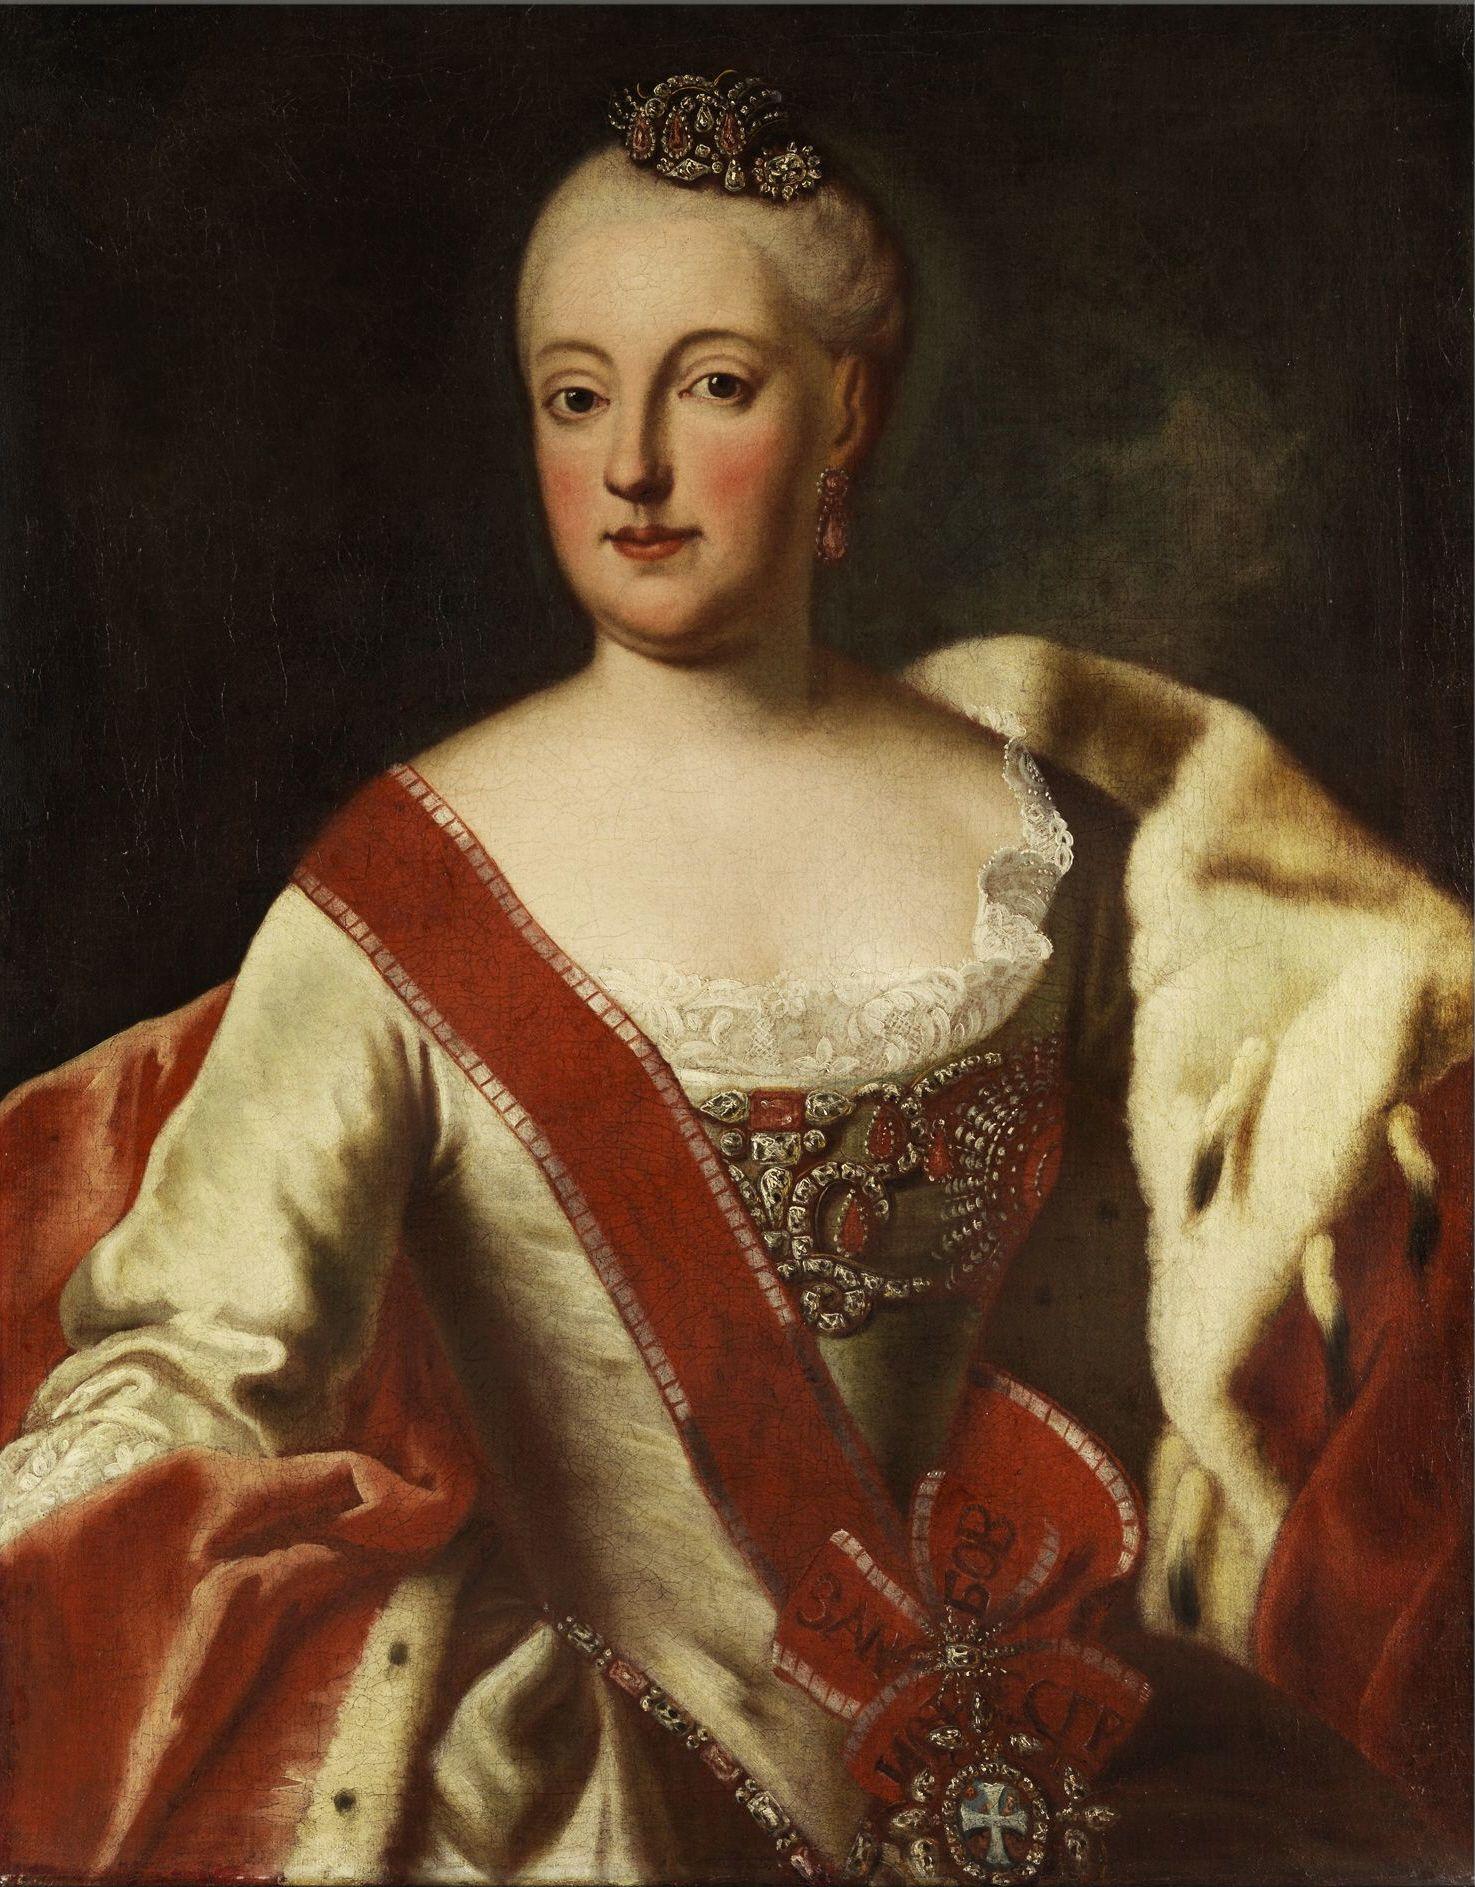 Maria Anna Sophia Sabina Angela Franziska Xaveria of Sachsen (1728-1797)